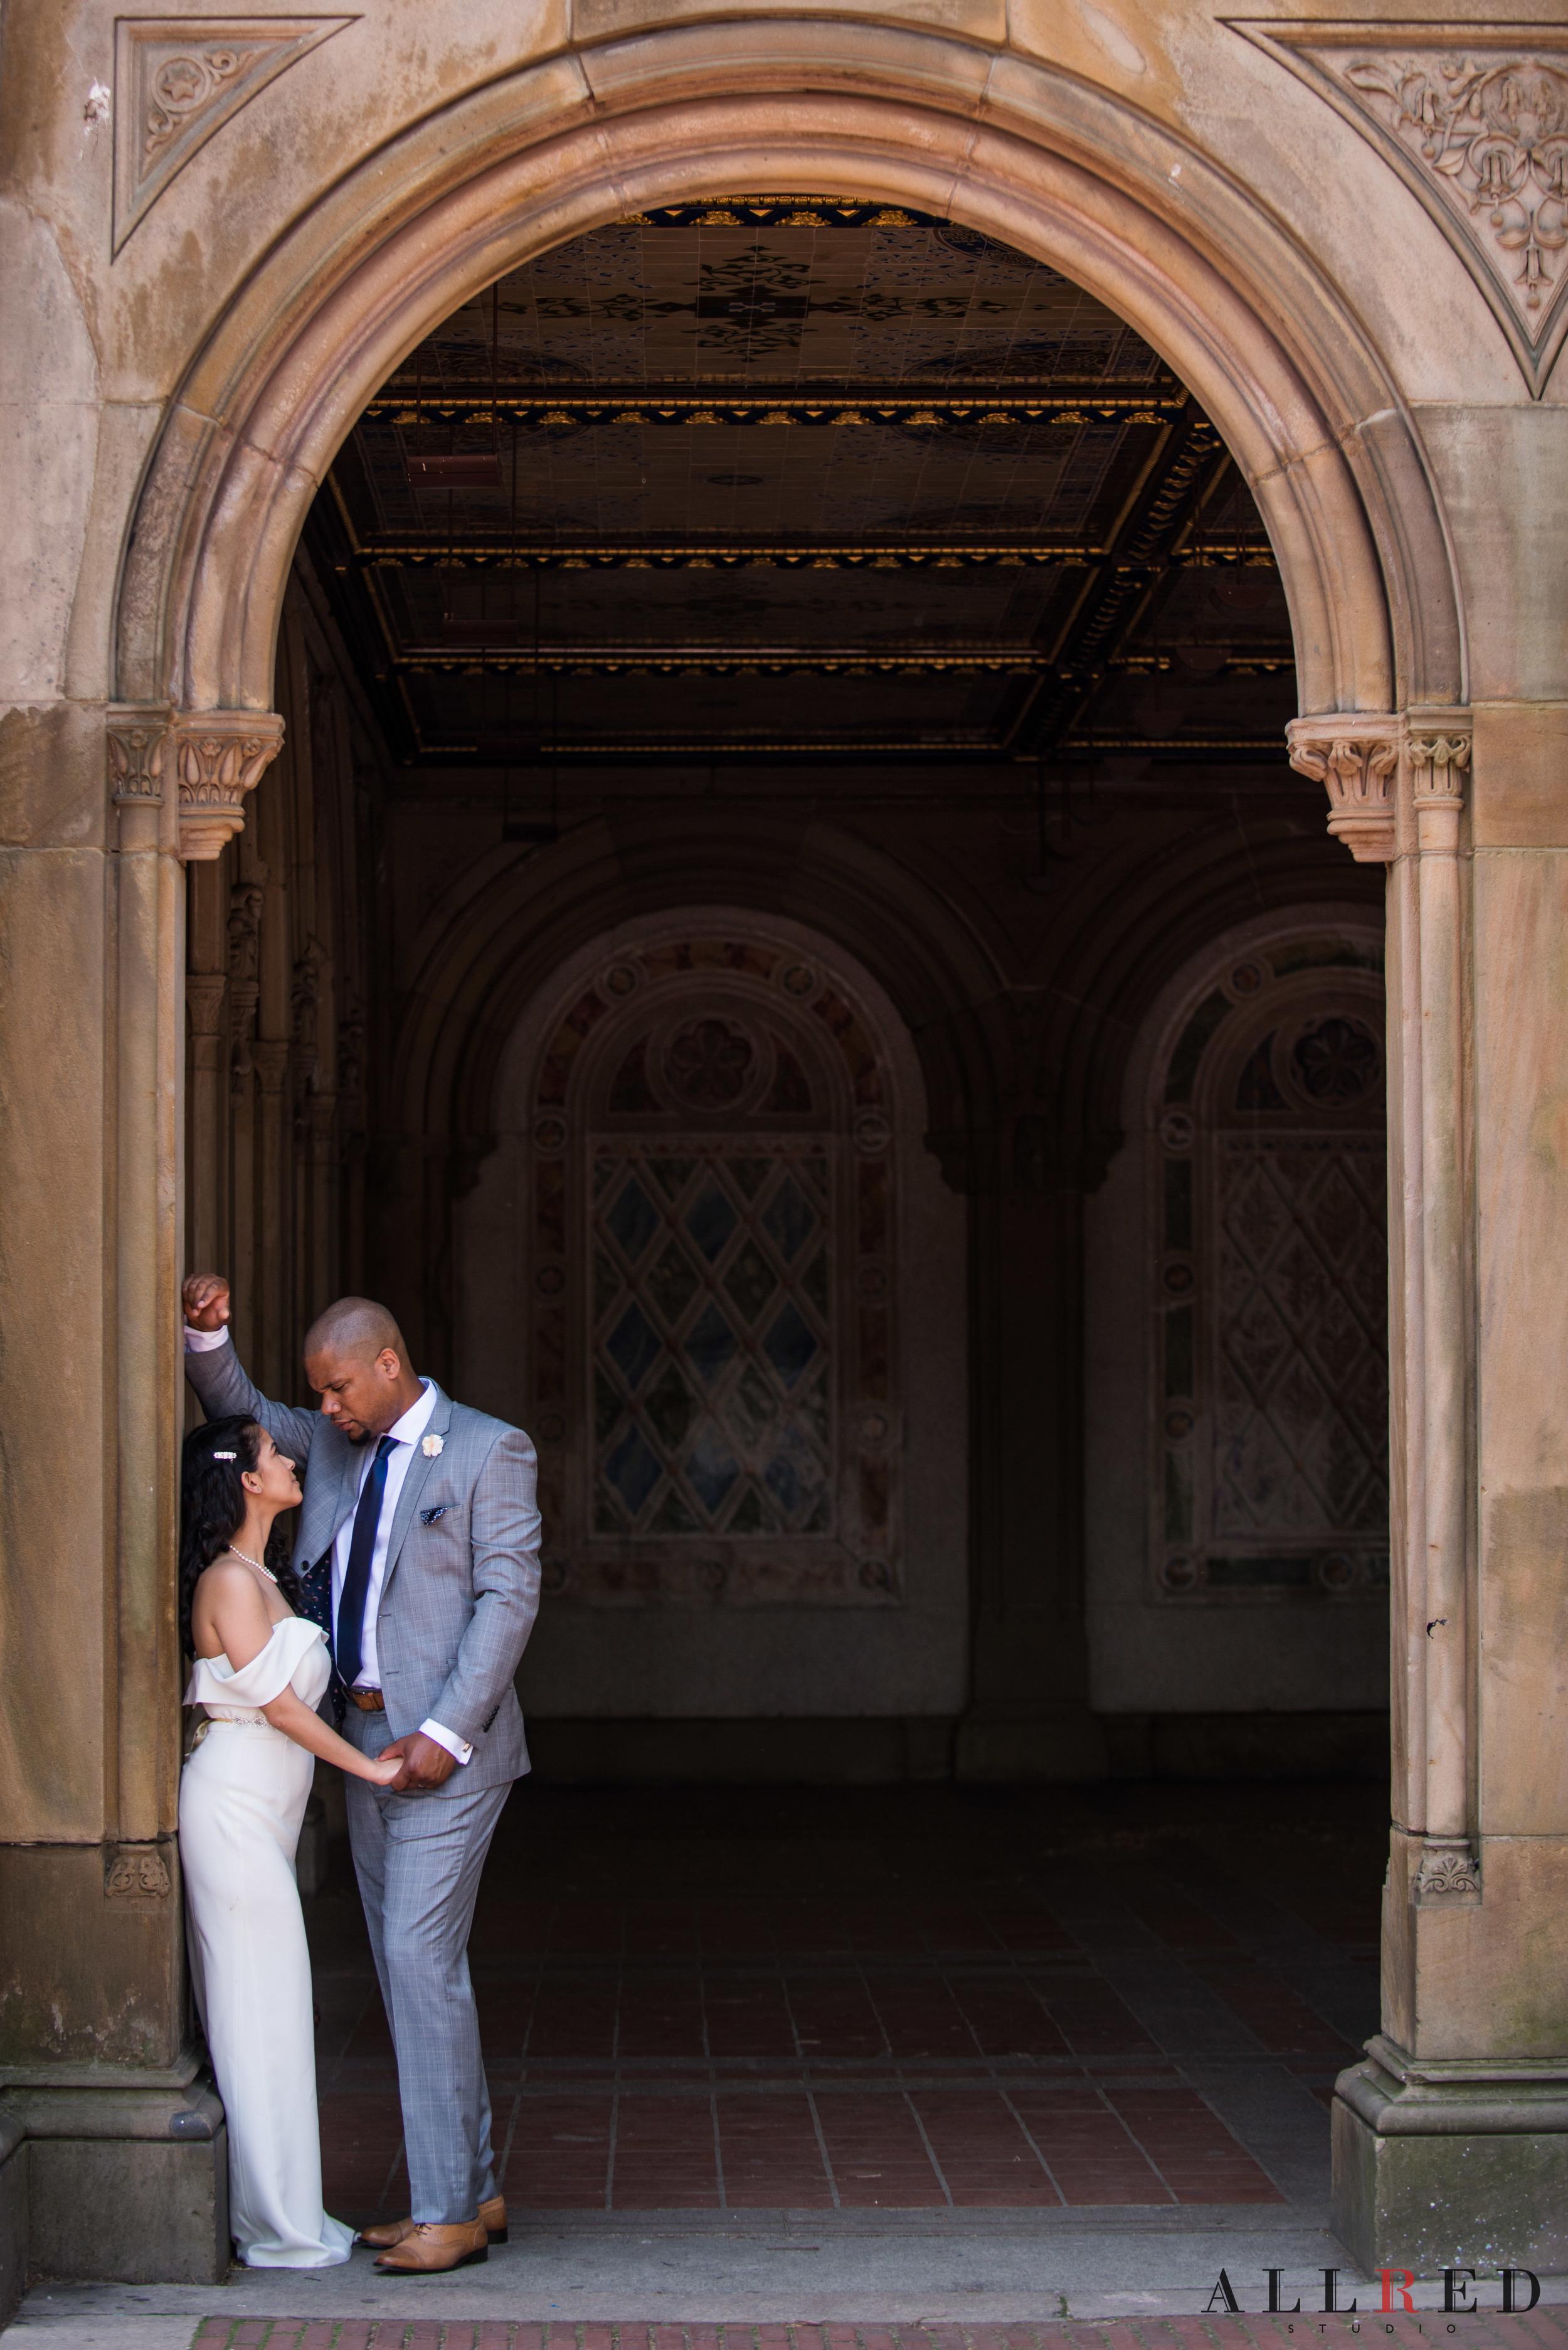 Wedding-central-park-allred-studio-new-york-photographer-new-jersey-hudson-valley-2568.jpg